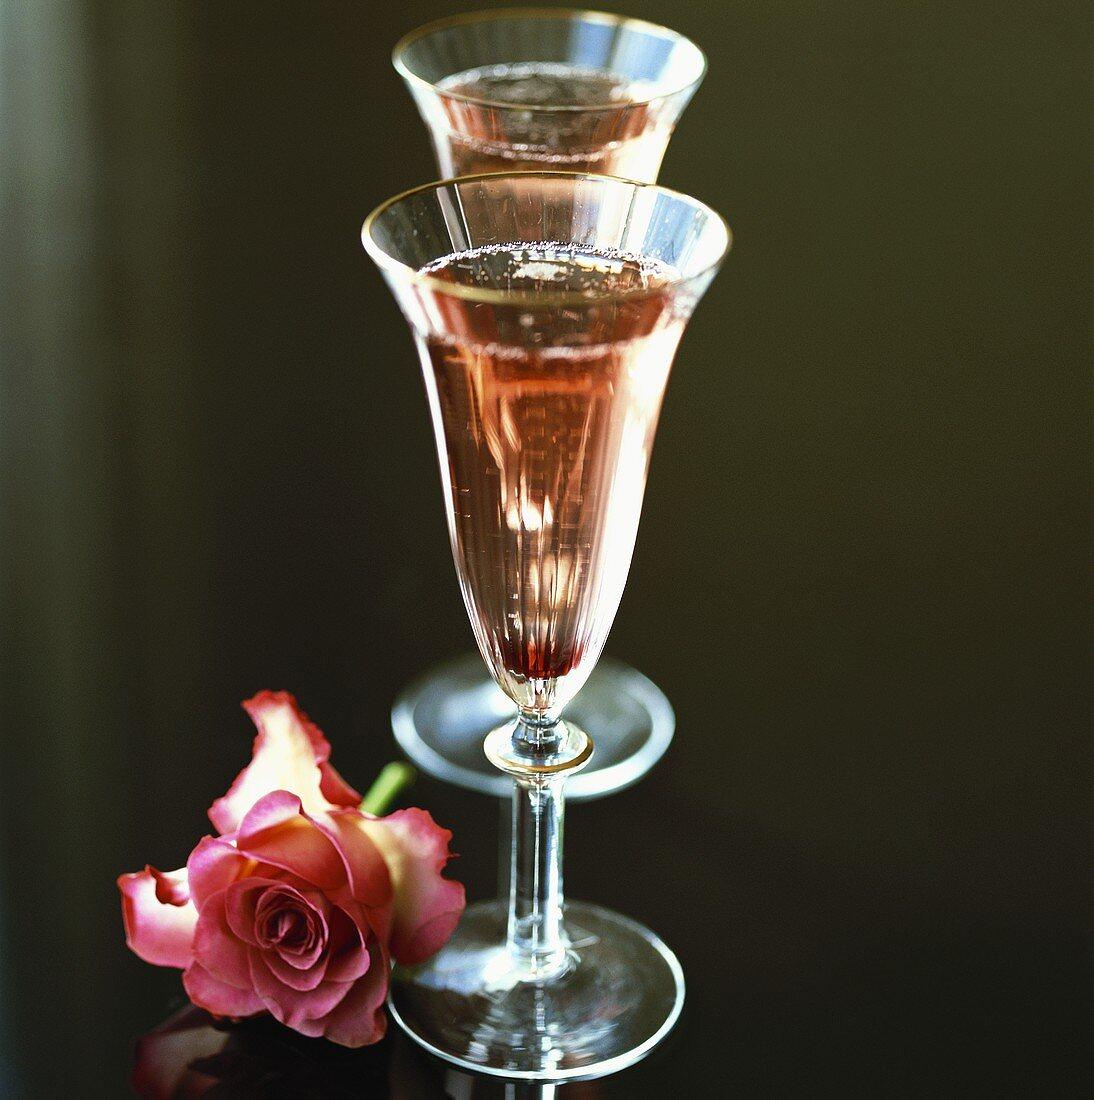 Two glasses of Kir Royal, a rose beside them